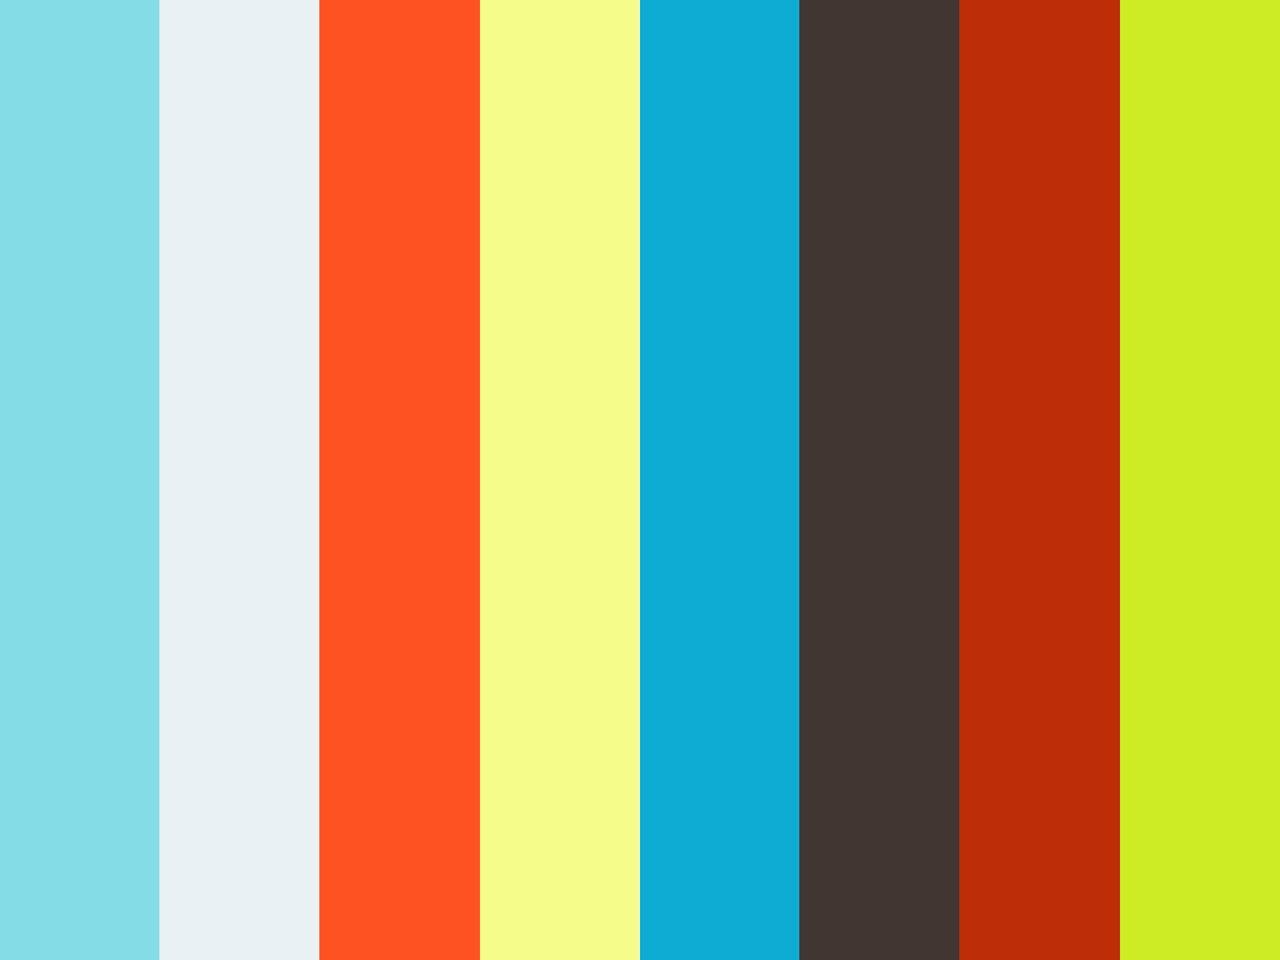 171014 CARONNESE-DERTHONA HIGHLIGHTS